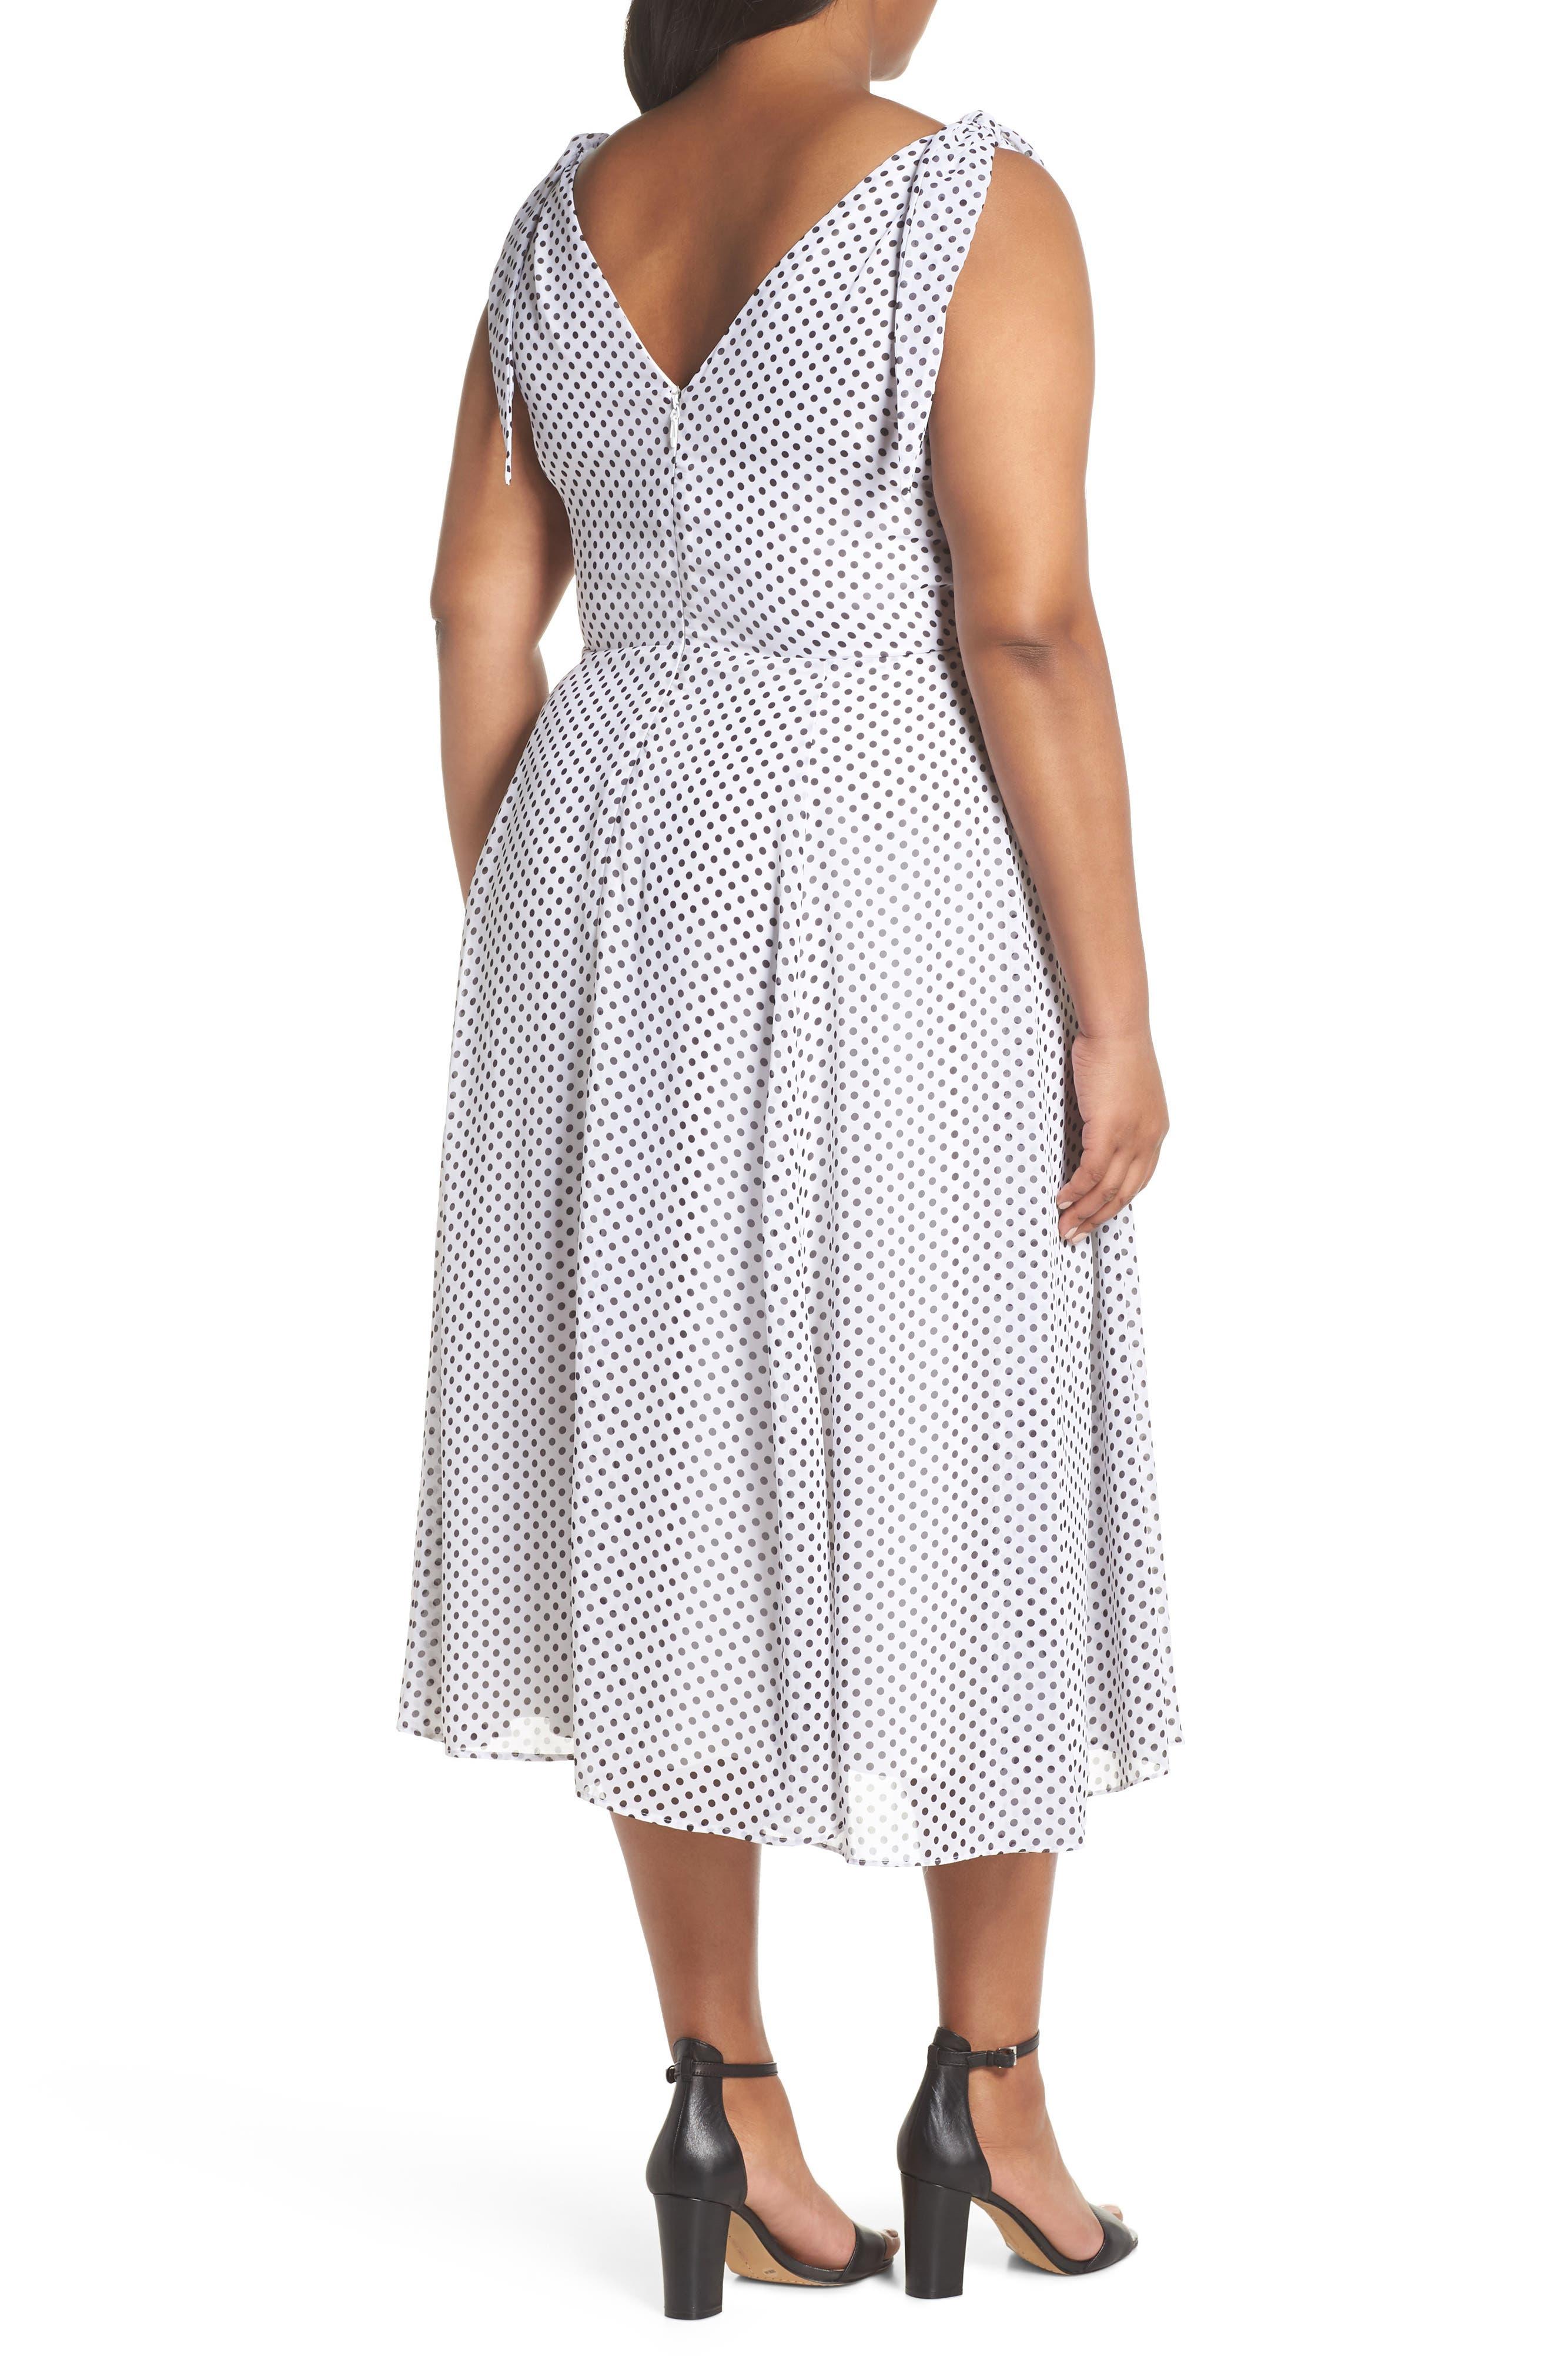 CITY CHIC, Alika Dot Fit & Flare Dress, Alternate thumbnail 2, color, IVORY